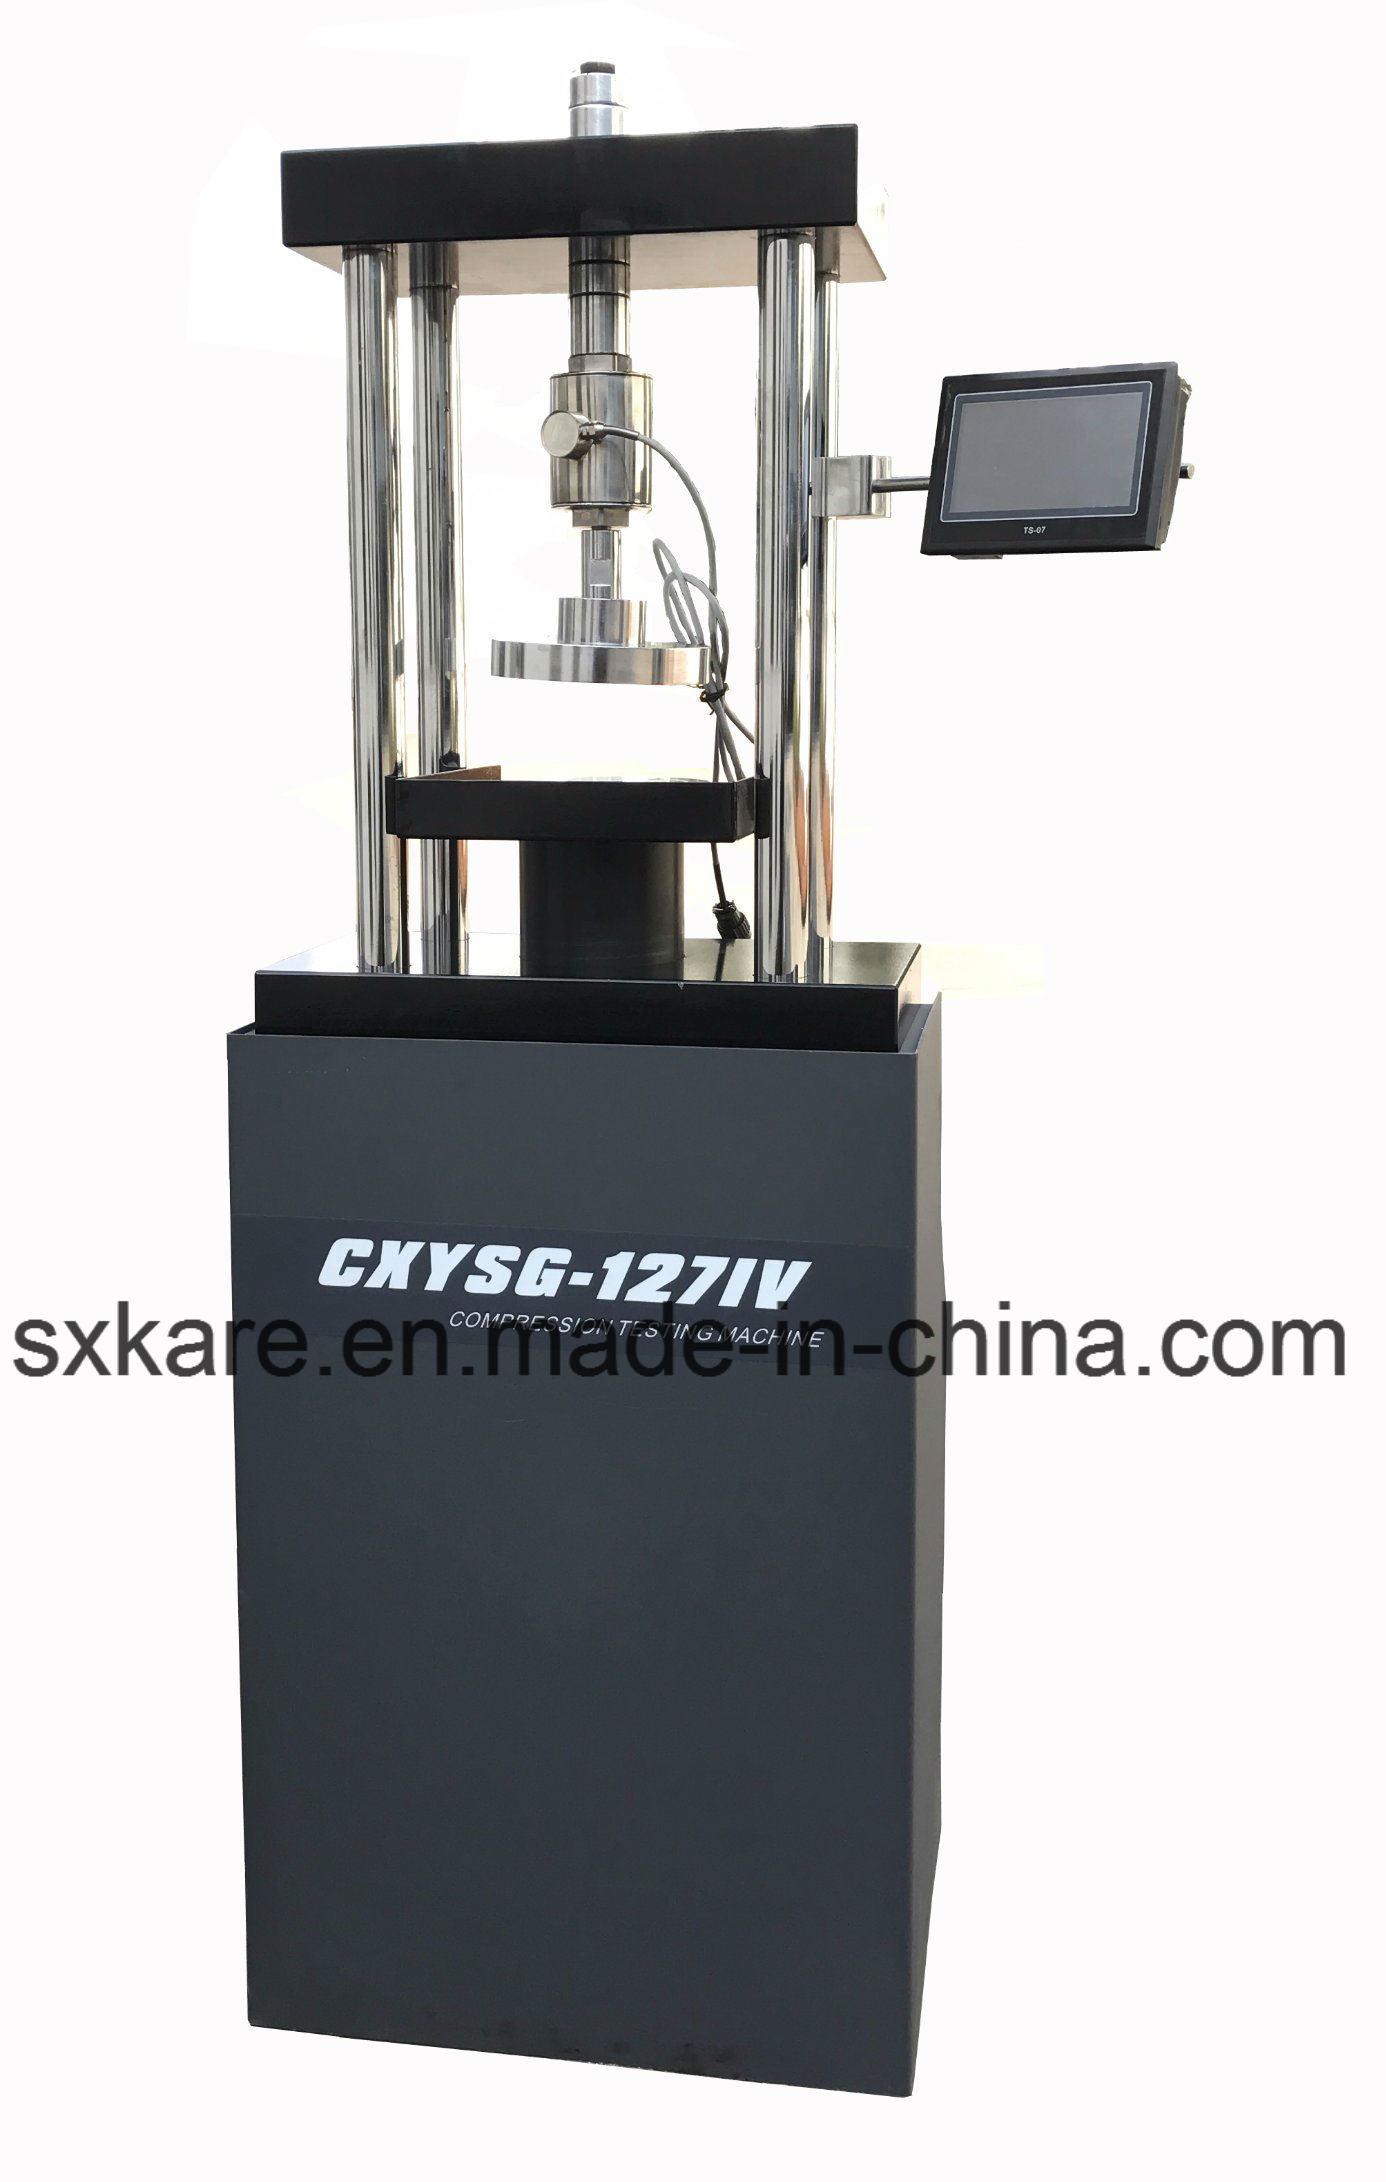 Pavement Material Strength Testing Machine Mainframe, Cbr Testing Machine (CXYSG-127V)